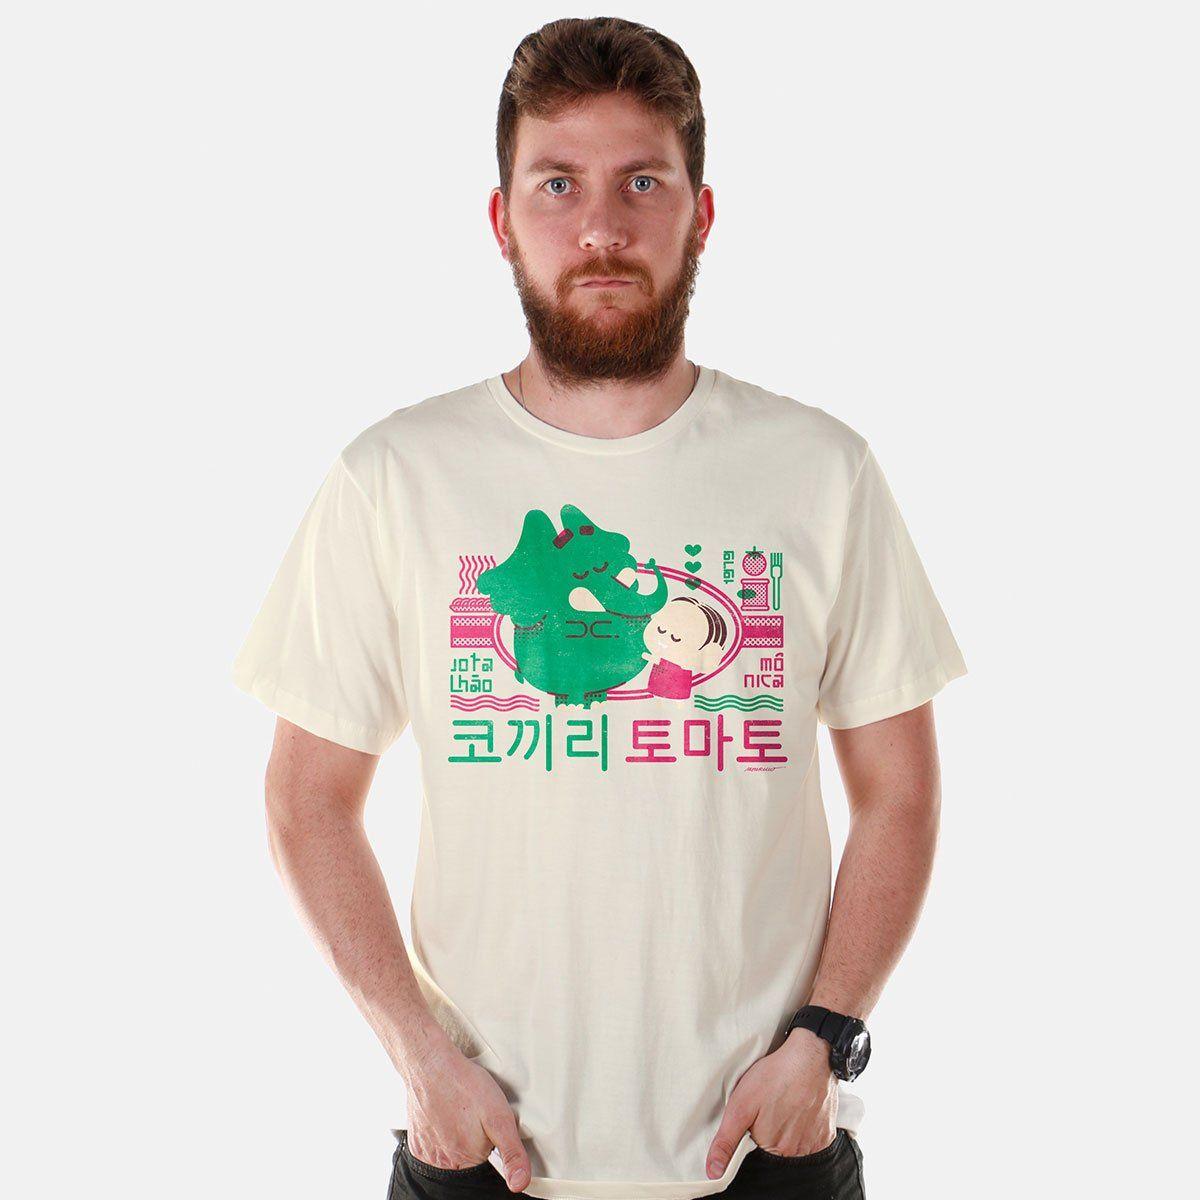 Camiseta Masculina Turma da Mônica - Mônica e Jotalhão